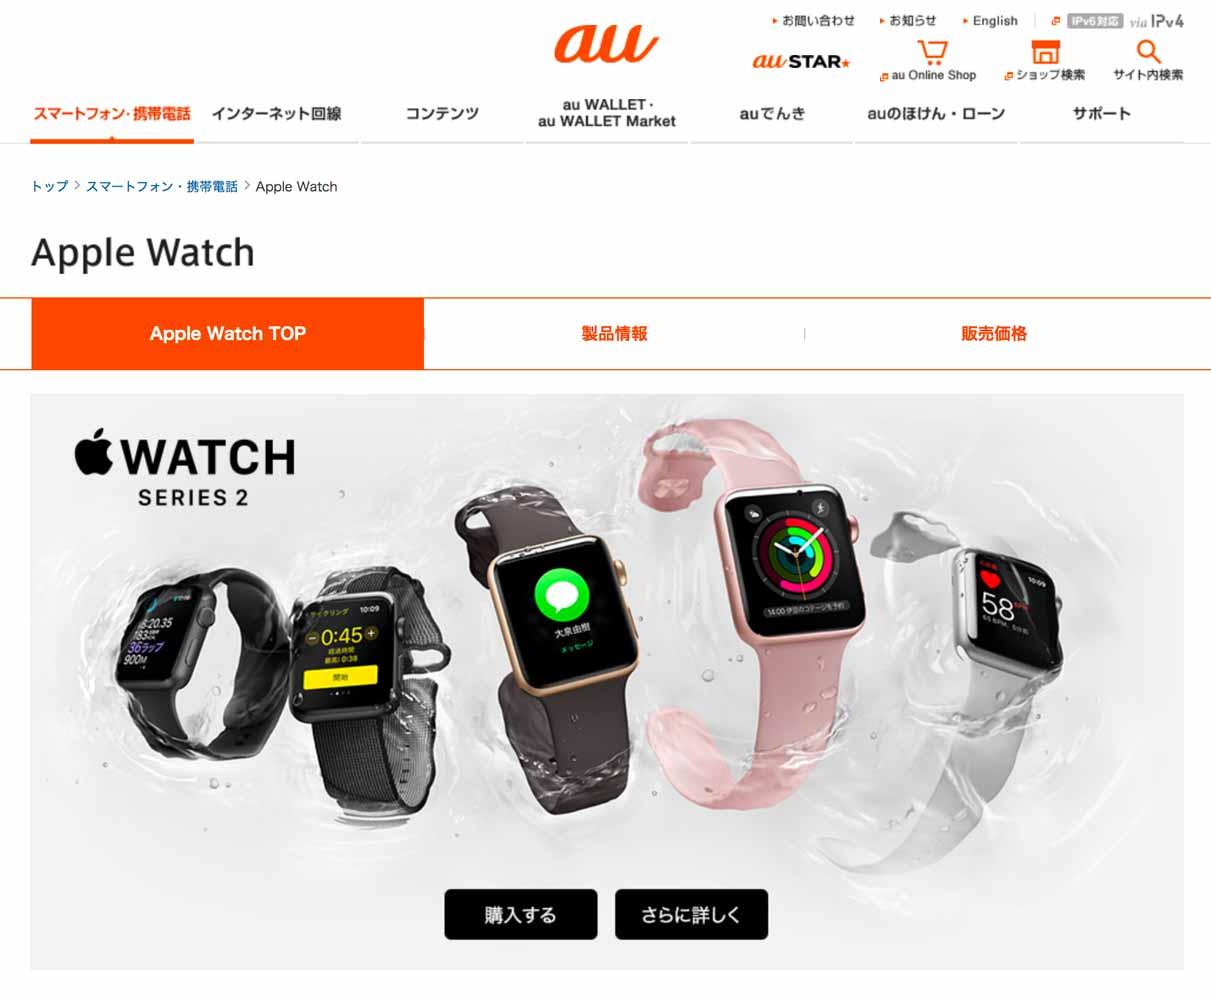 KDDI、「Apple Watch Series 2」の取扱店を拡大 〜 au Online Shopなどでも購入可能に